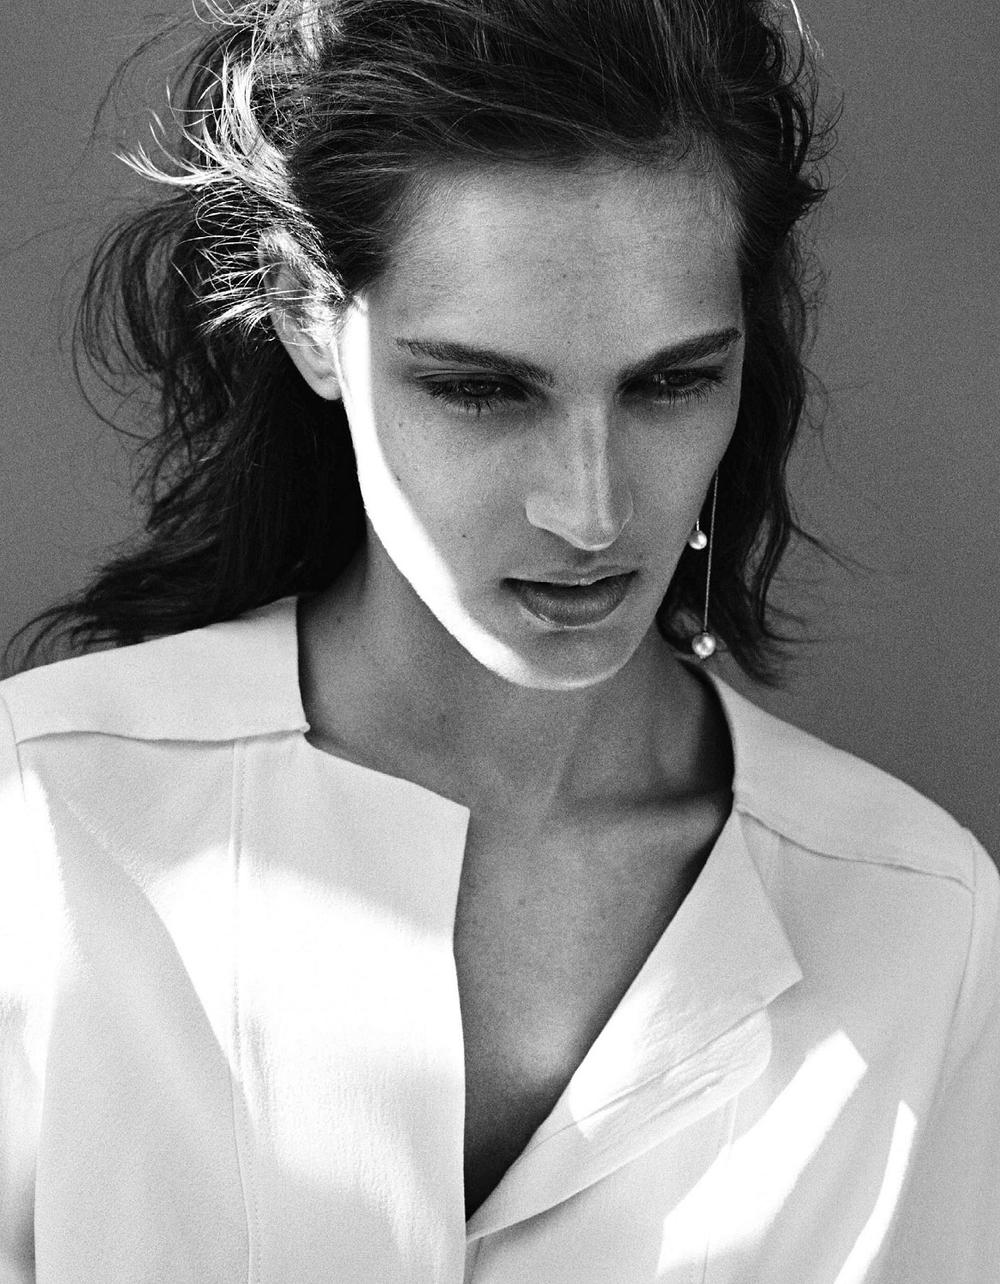 Emma-Tempest-Othilia-Simon-The-Telegraph-October-2014-1.jpeg